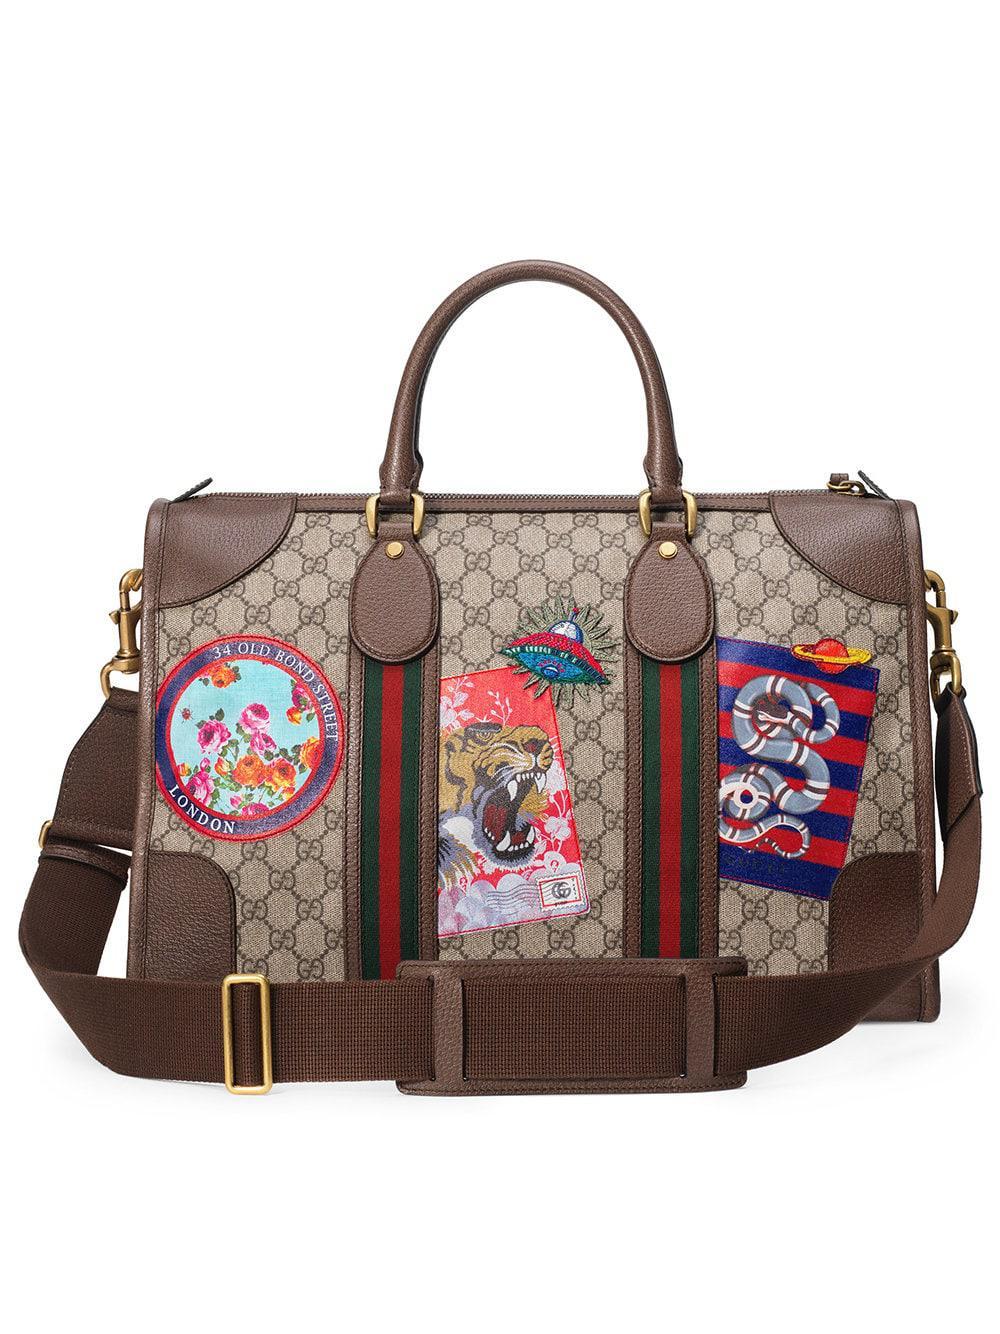 Gucci - Multicolor Leather Courrier GG Supreme Duffle Bag for Men - Lyst.  View fullscreen 7b364d5928f7e